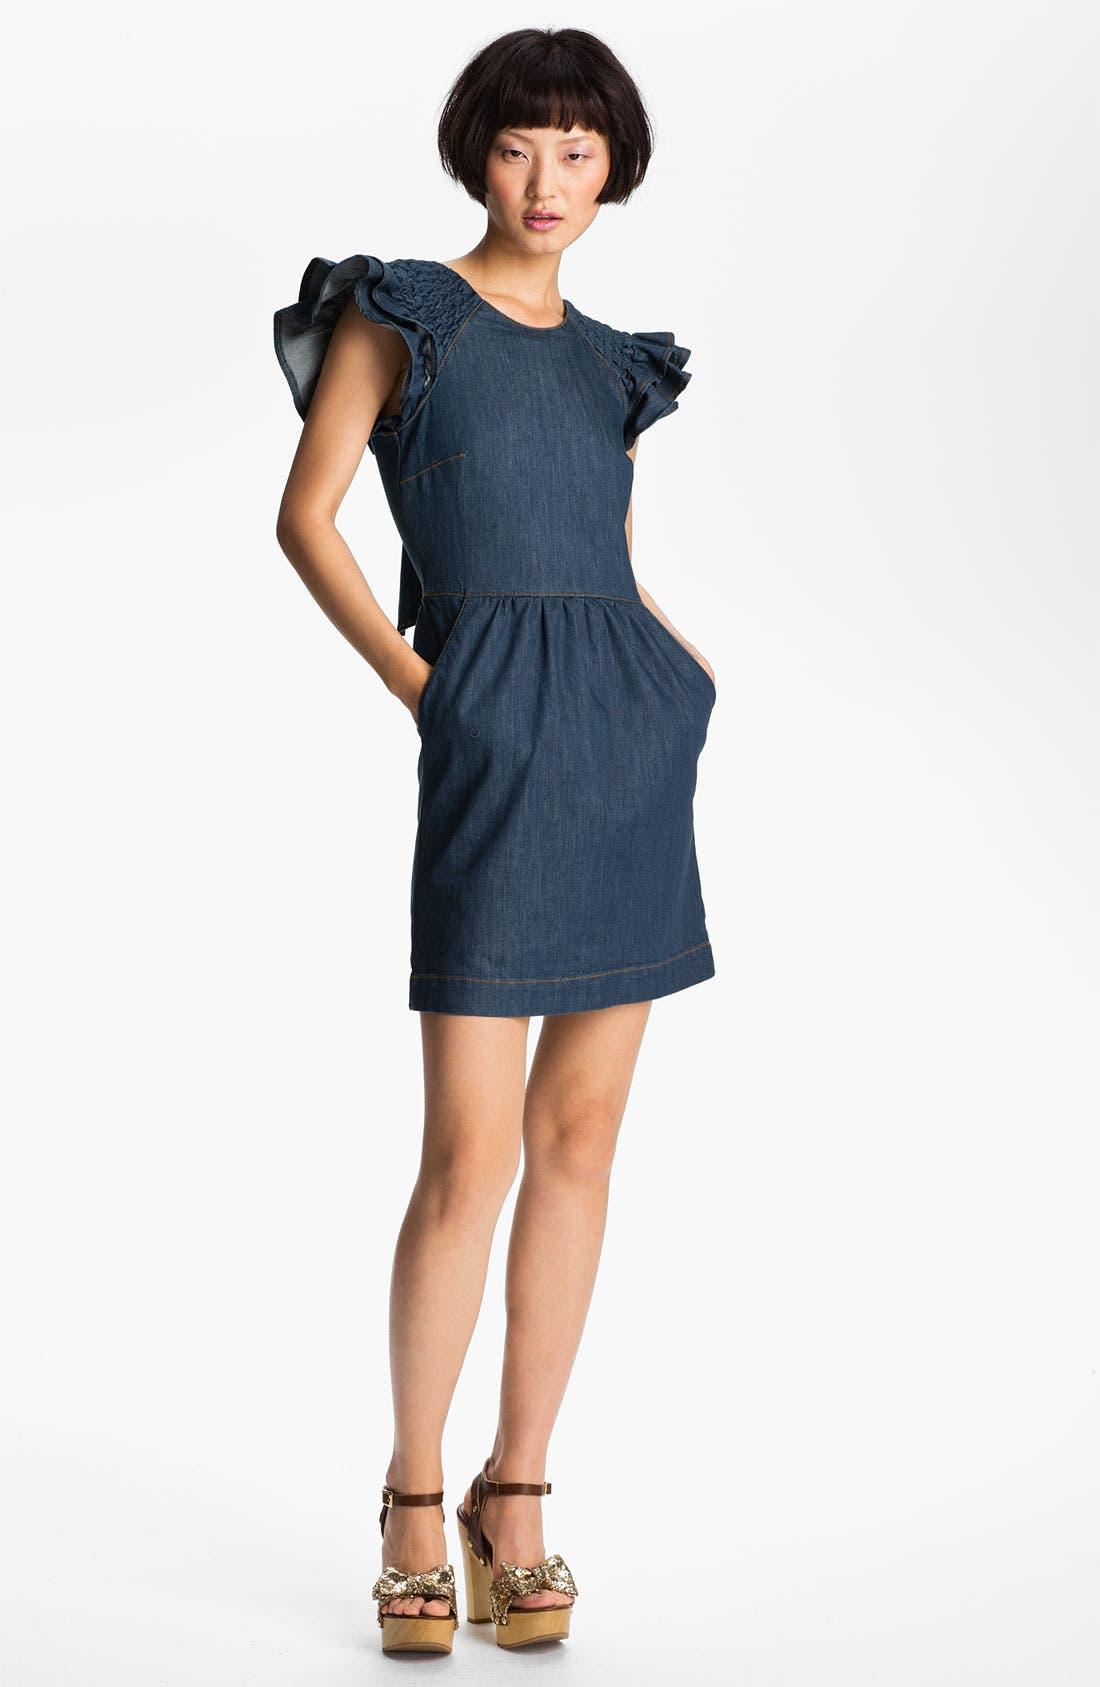 Alternate Image 1 Selected - RED Valentino Ruffle Sleeve Denim Dress